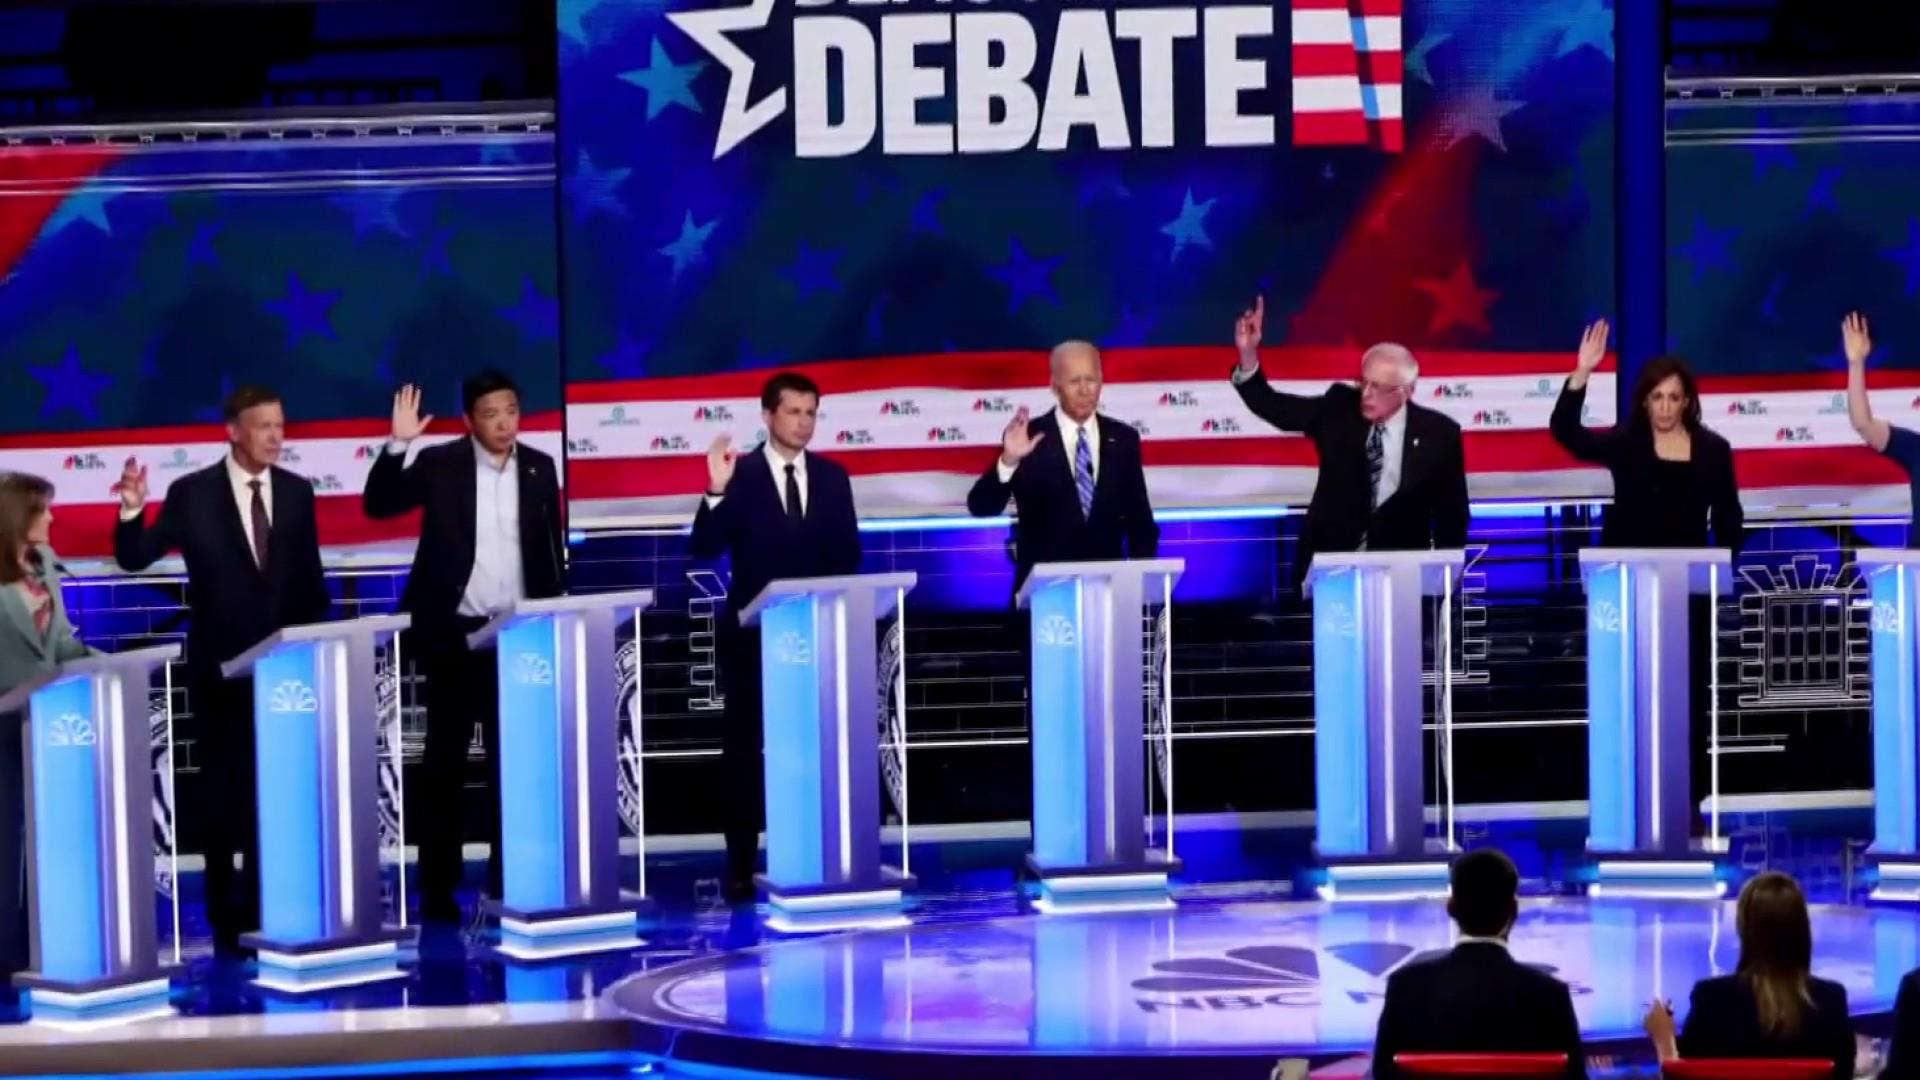 Who will debate whom in second Democratic debate?